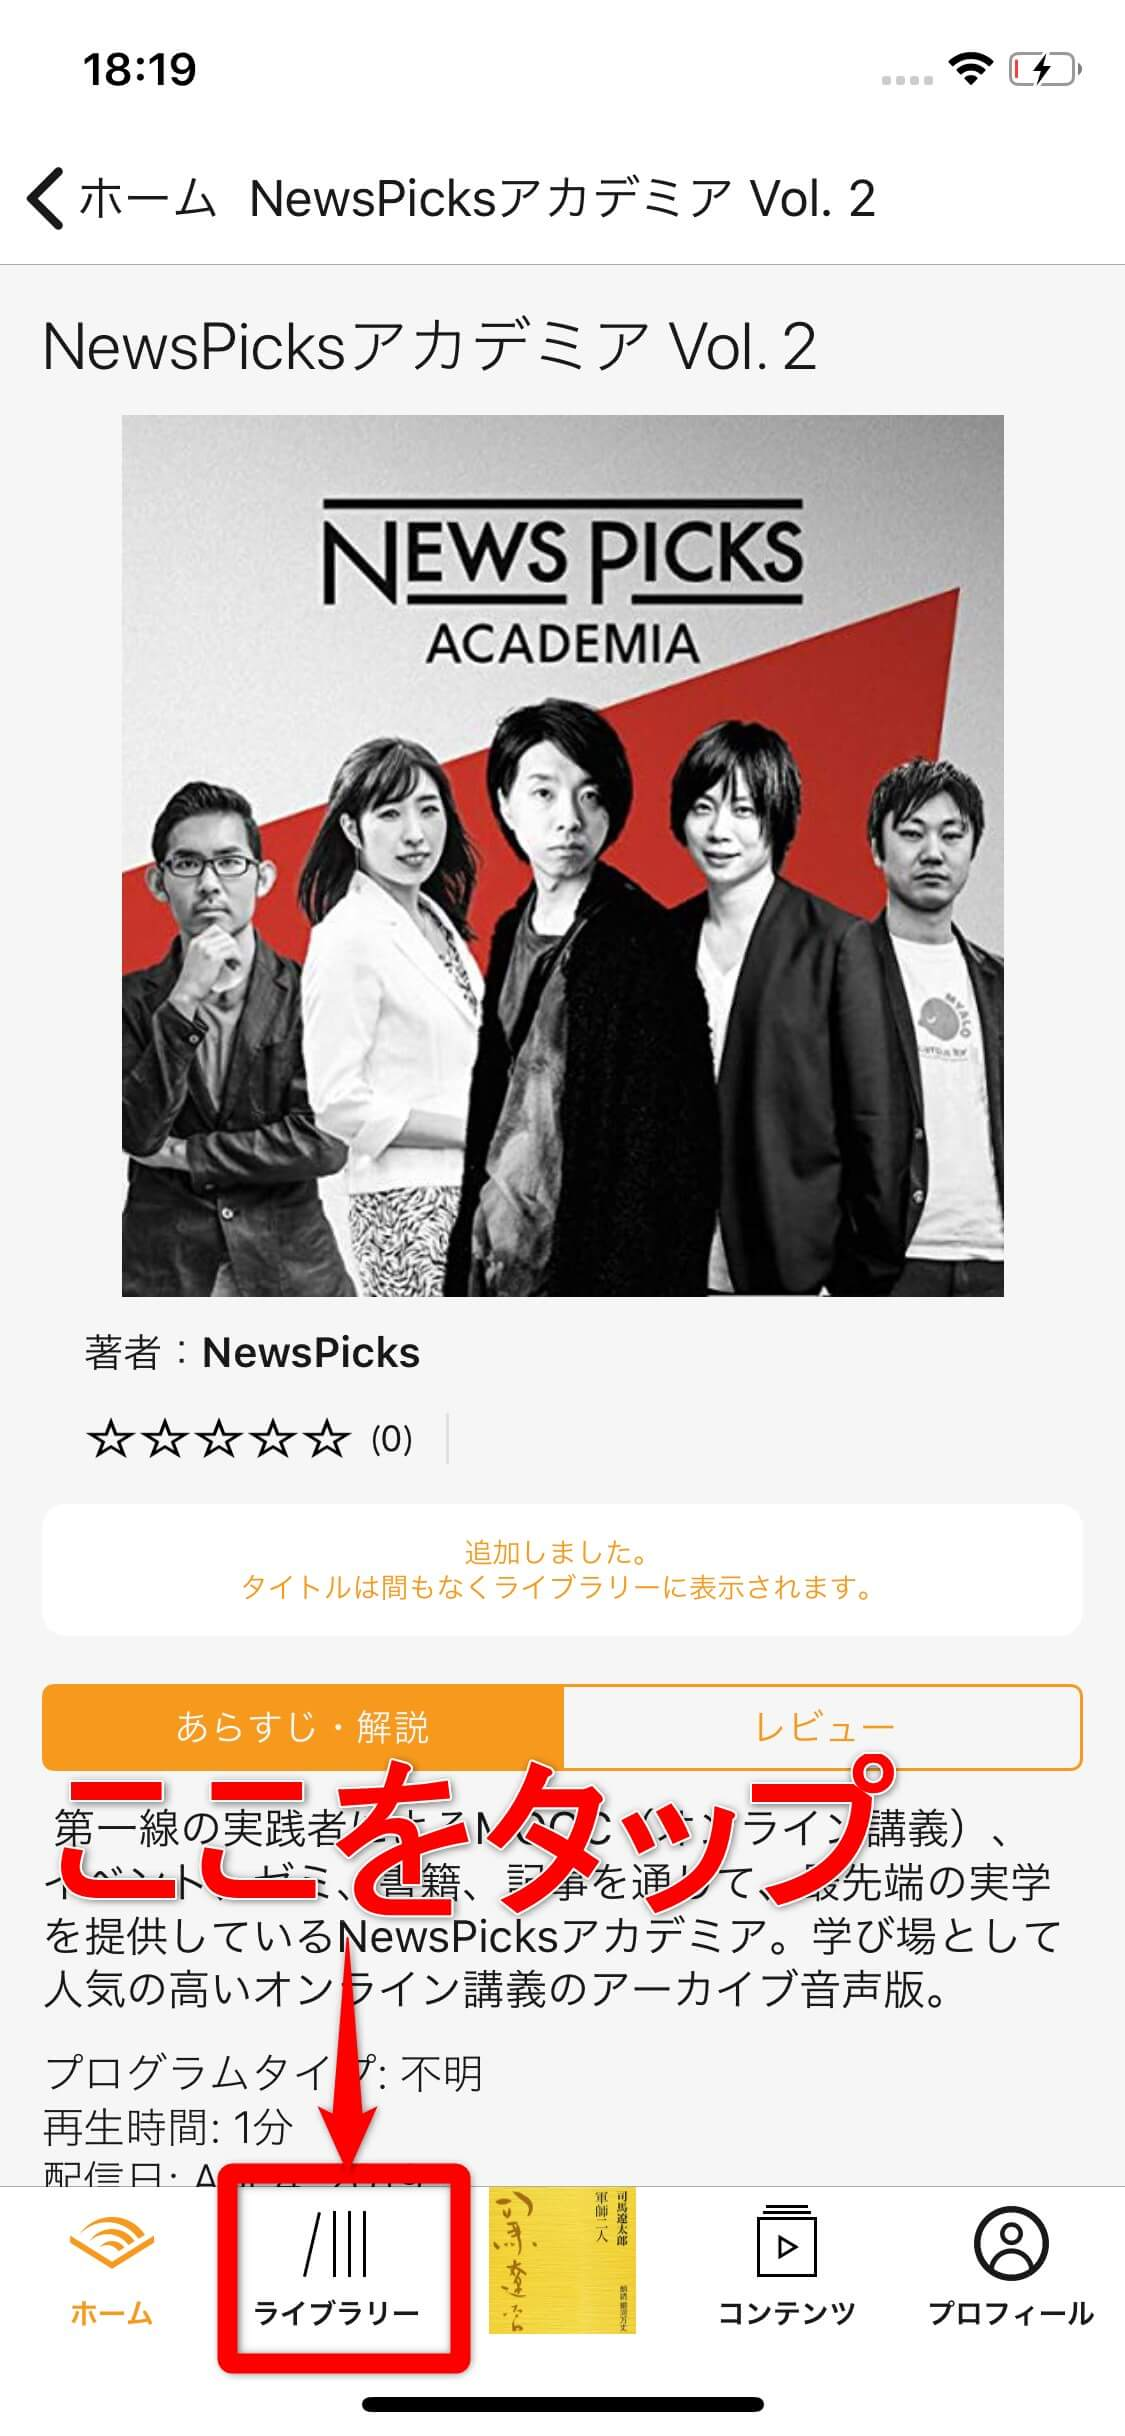 Audible(オーディブル)アプリでライブラリーを表示する画面